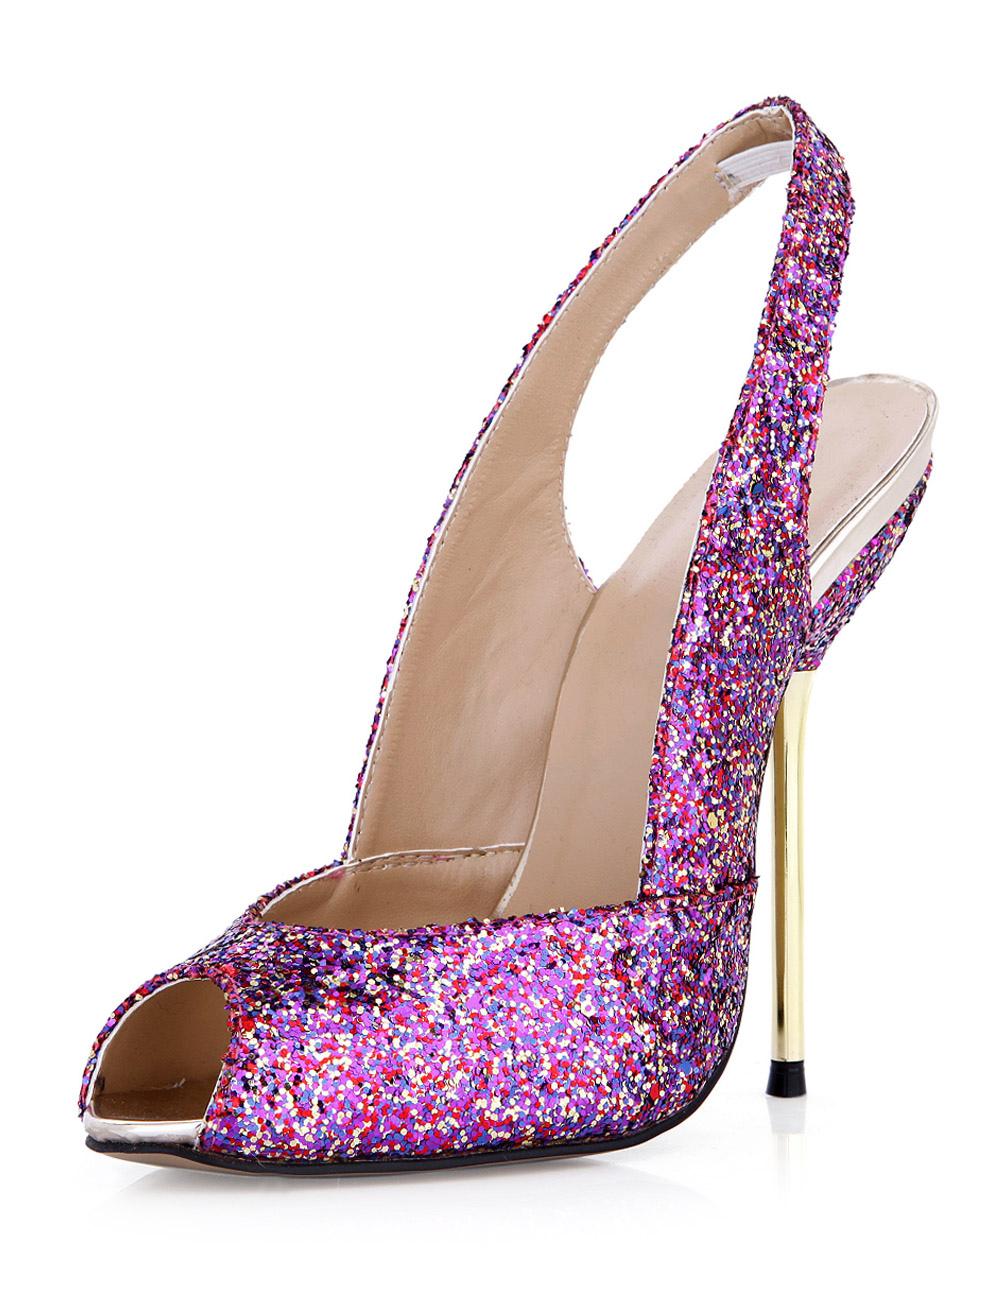 High Heel Sandals Fuchsia Peep Toe Slingbacks Sandal Shoes Women Dress Shoes